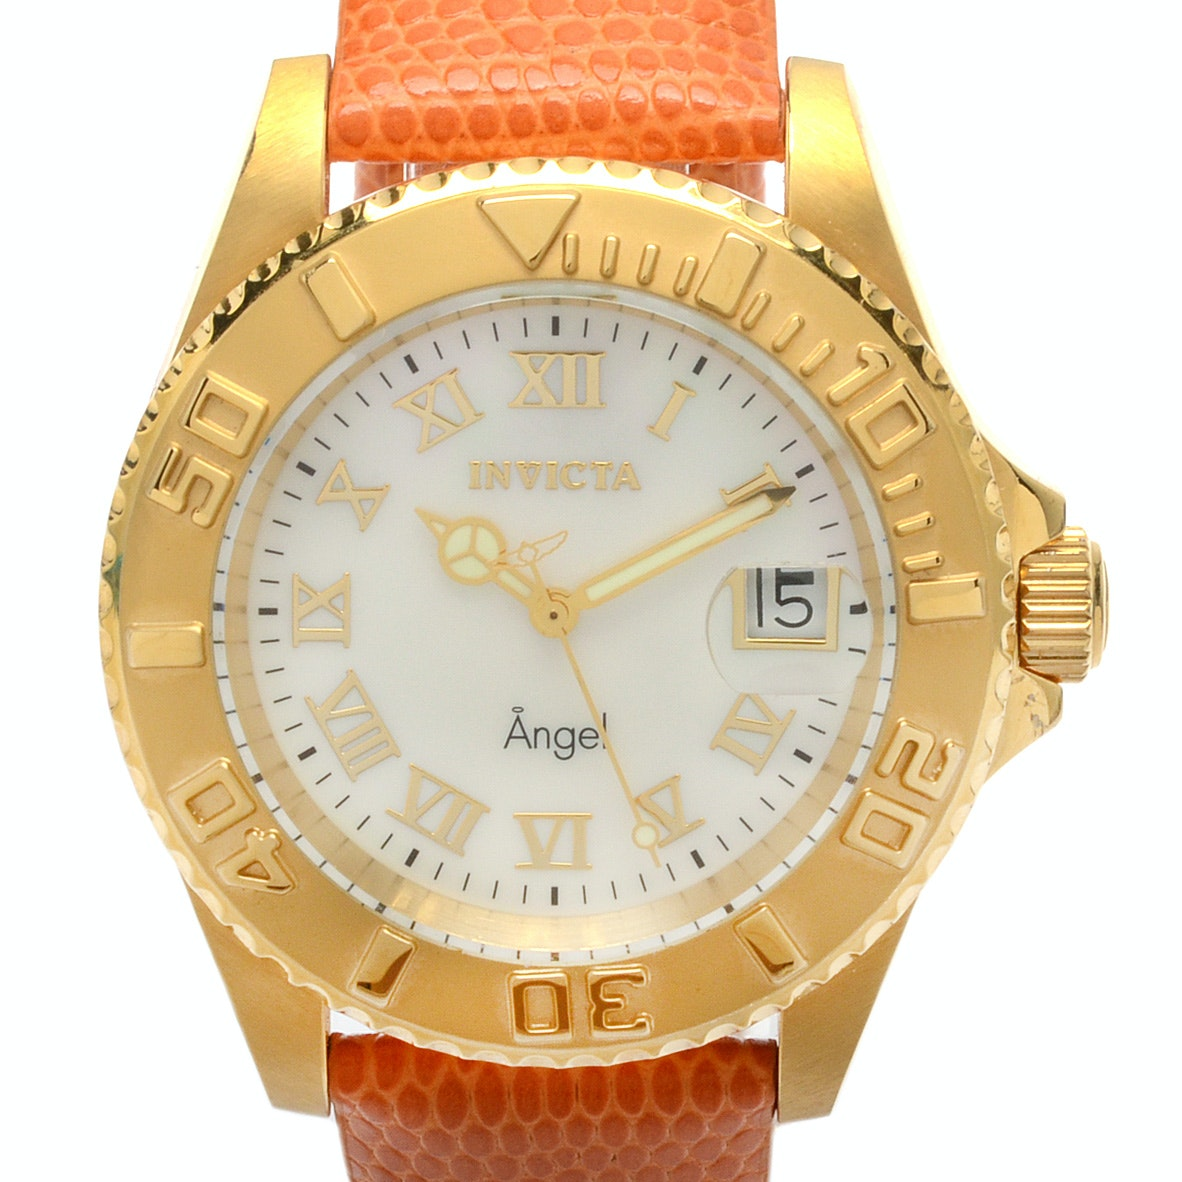 Invicta Angel Wristwatch